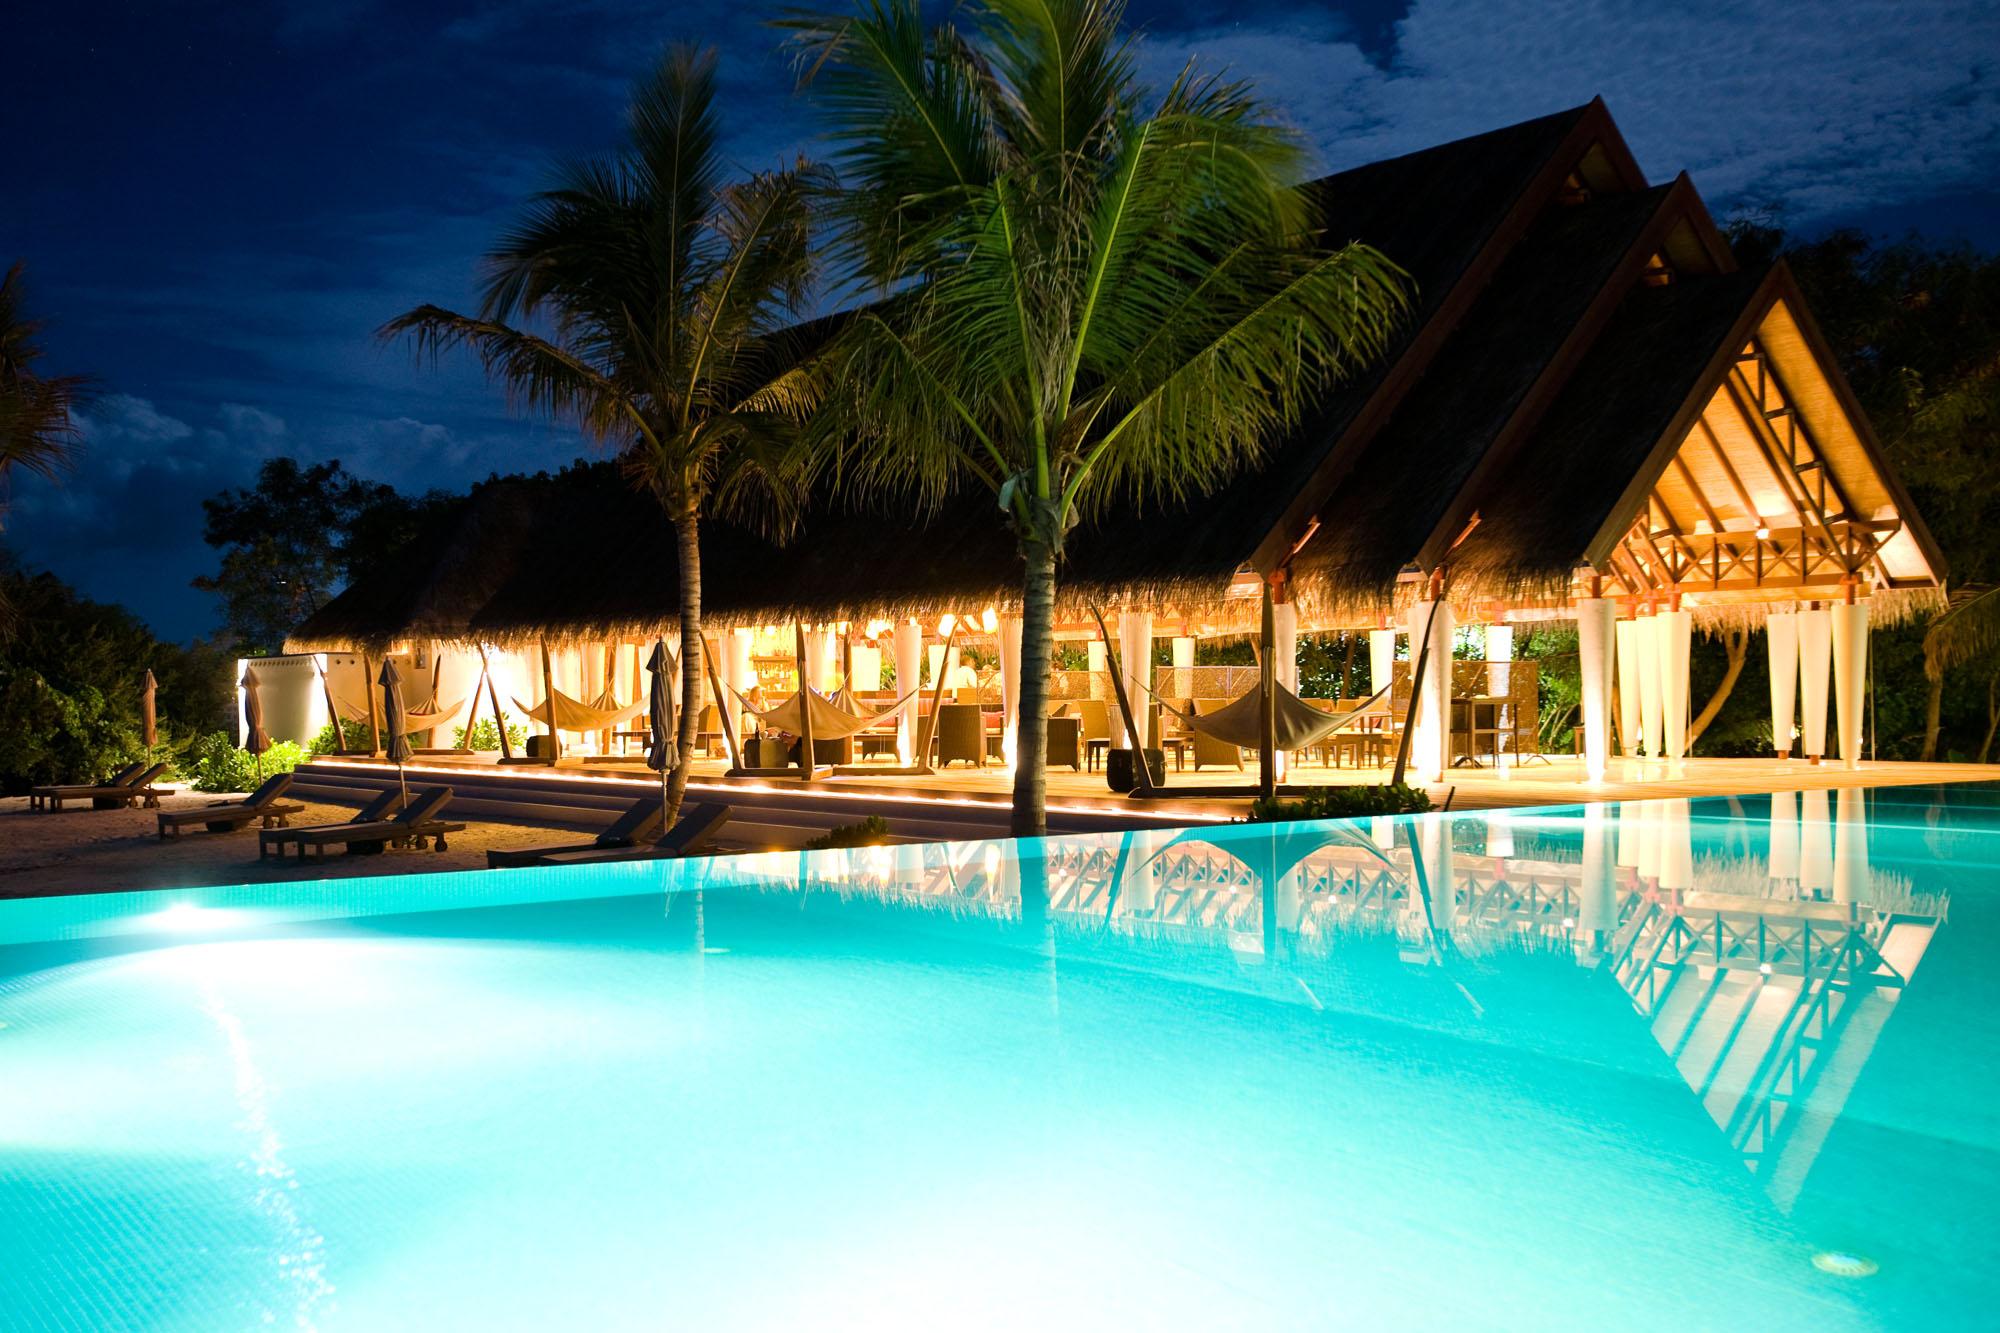 5 Star Lux Maldives Resort Architecture Amp Design